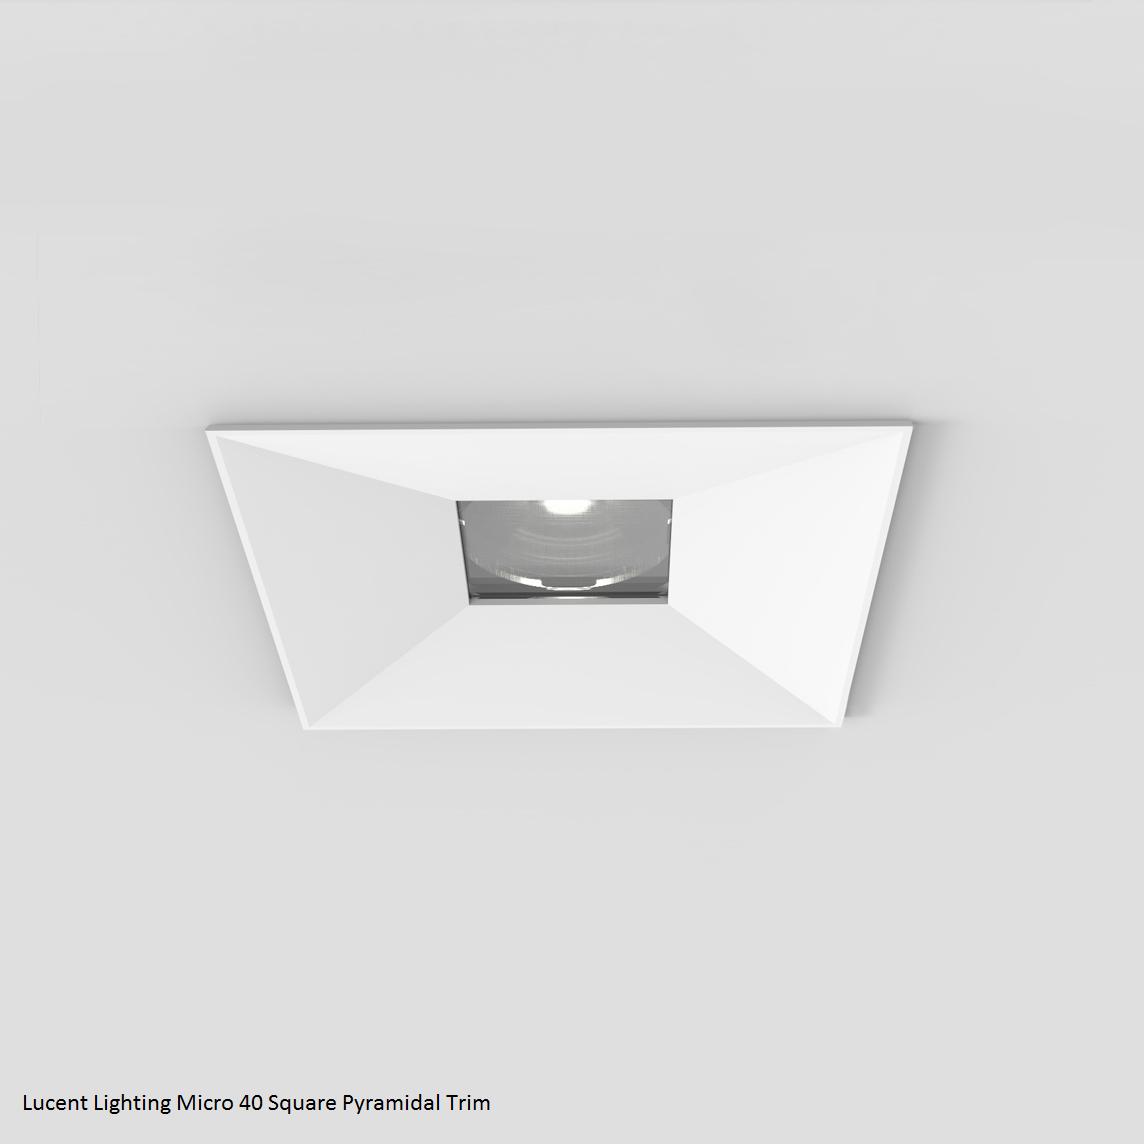 lucent-lighting-micro-40-pyramidal-trim